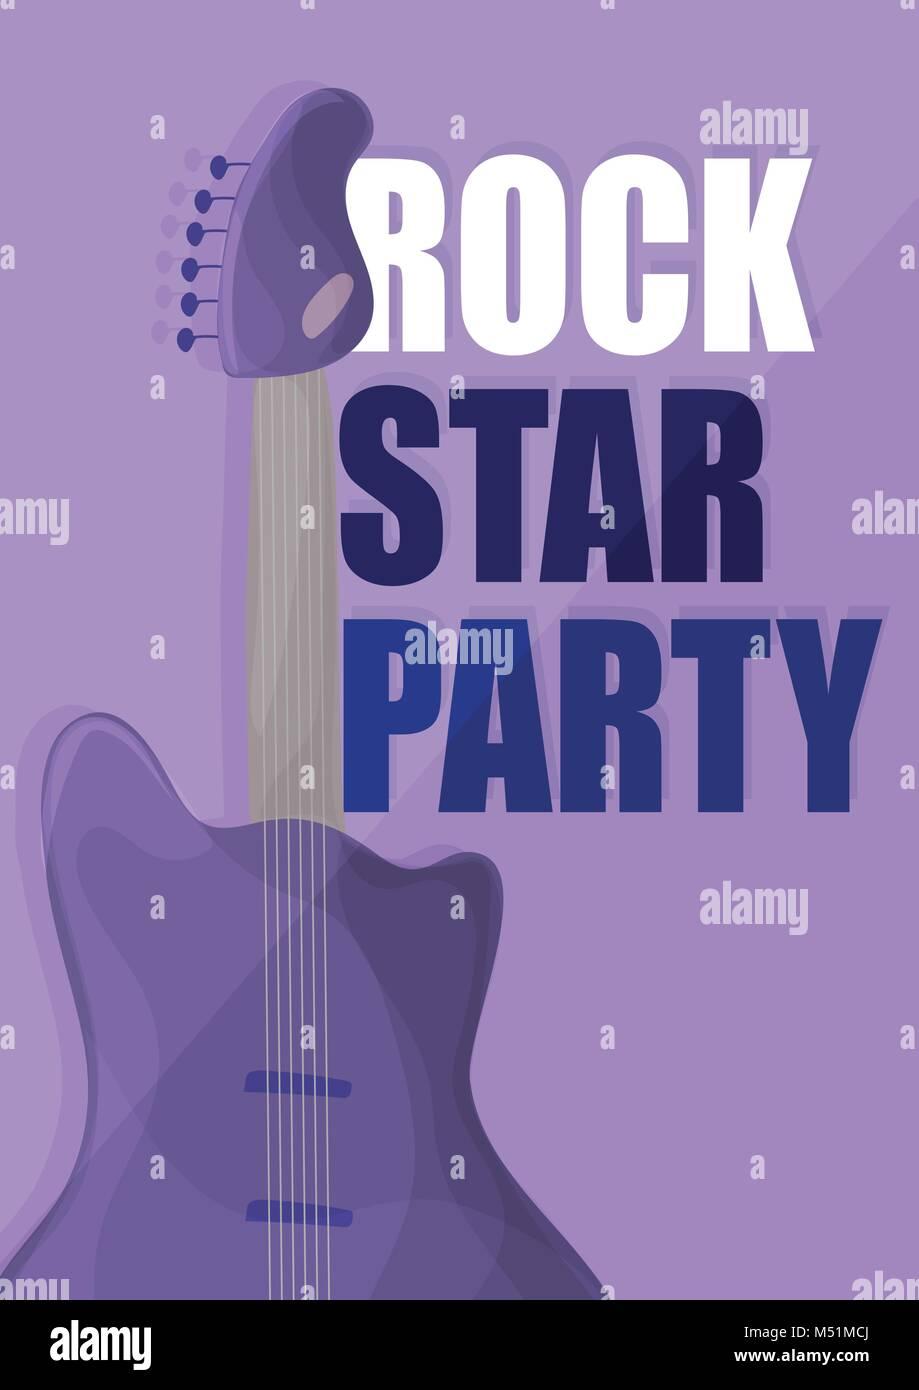 Rock Star Party, Musik poster Hintergrund Vorlage - Gitarre in lila Vektor Stockbild